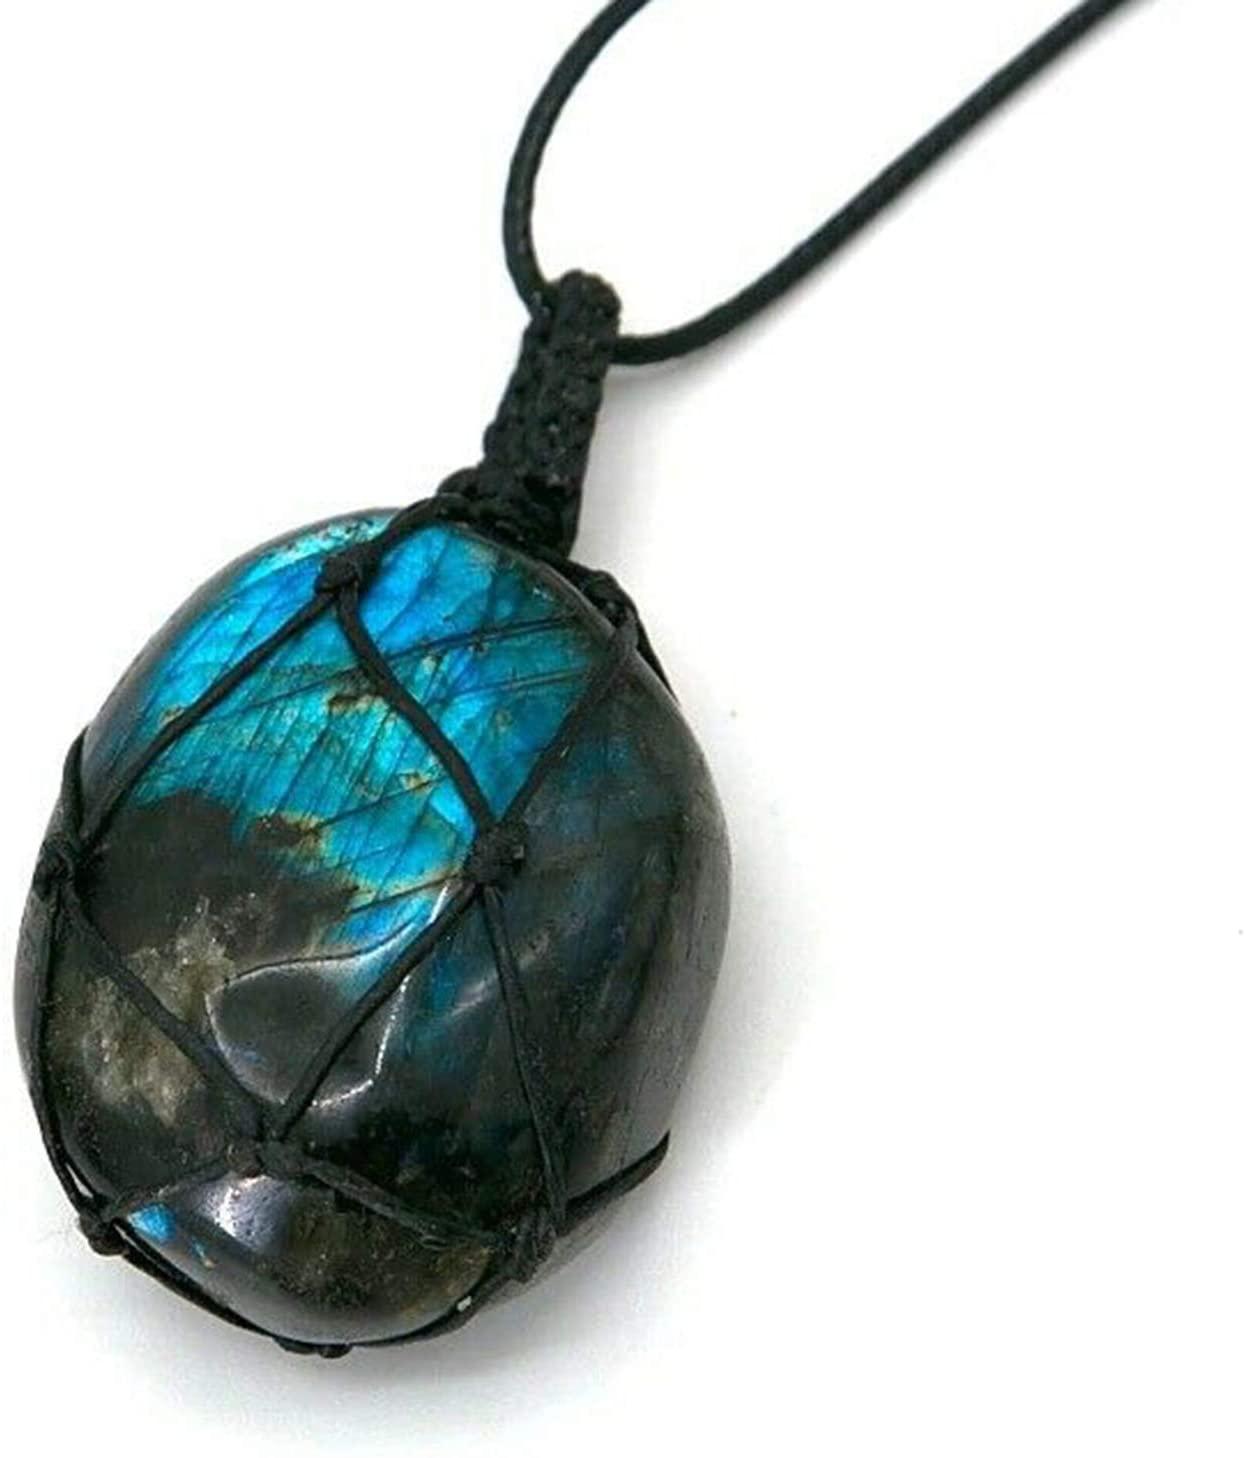 Rxan Moonstone Necklace, Labradorite Heart Pendant Energy Necklace Nature Moonstone Rough Stone Pendant Necklace Hand-Woven Style Unisex